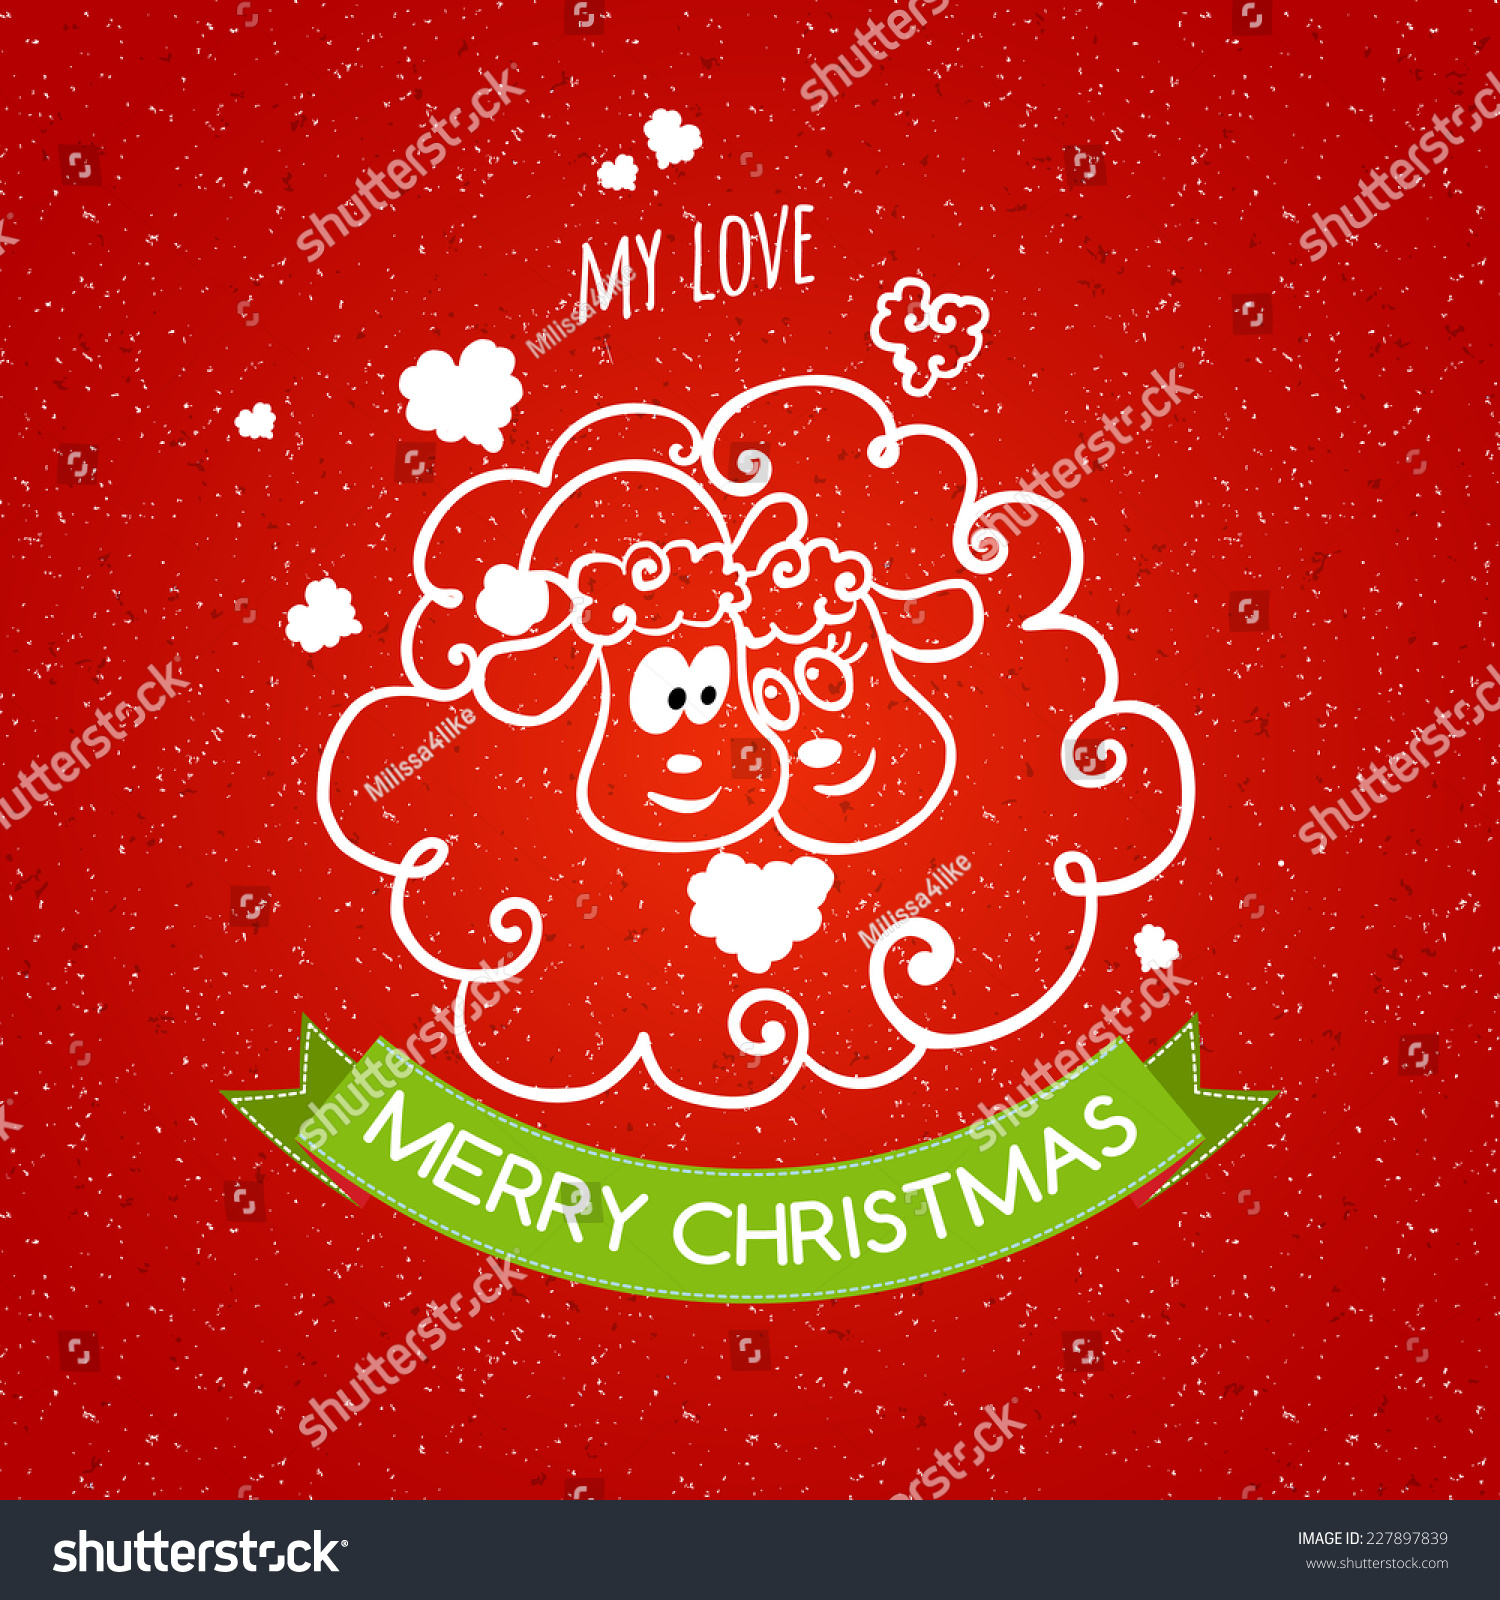 Merry Christmas Card Handdrawn Sheep Love Stock Vector Royalty Free